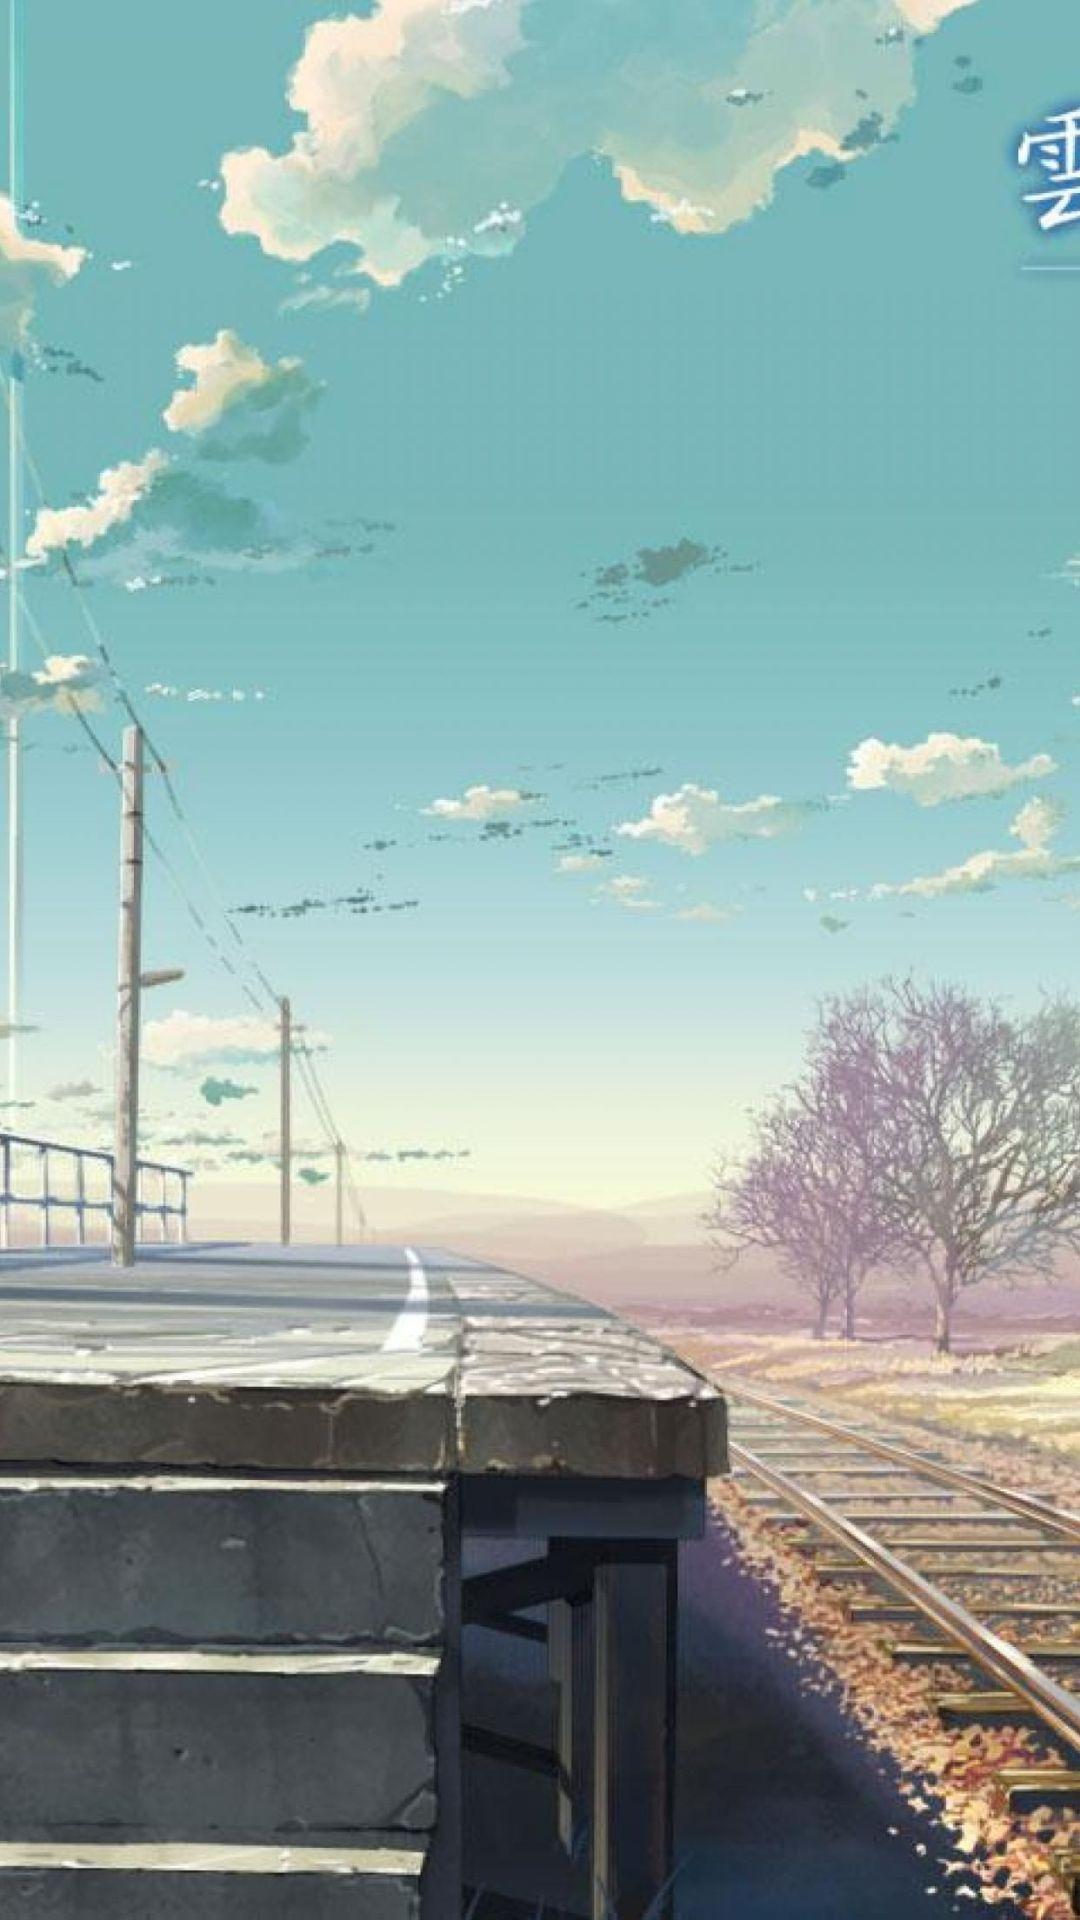 Sad Anime Apple wallpaper